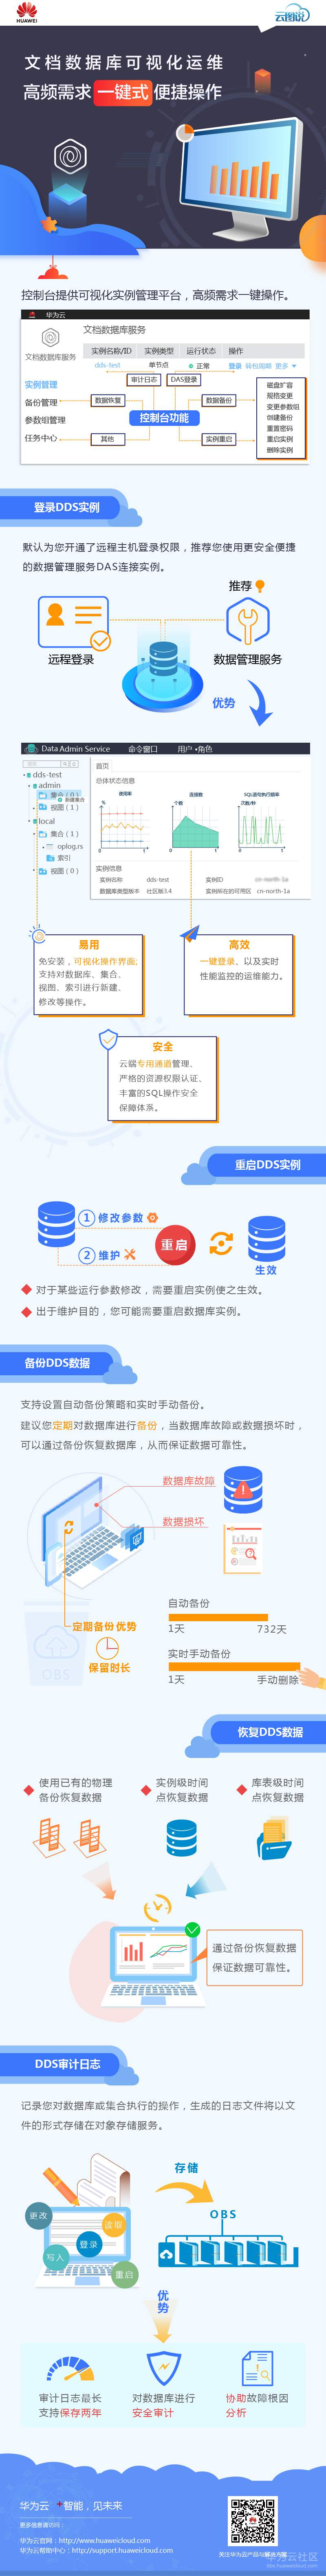 DDS-云图说(控制台高频操作).jpg